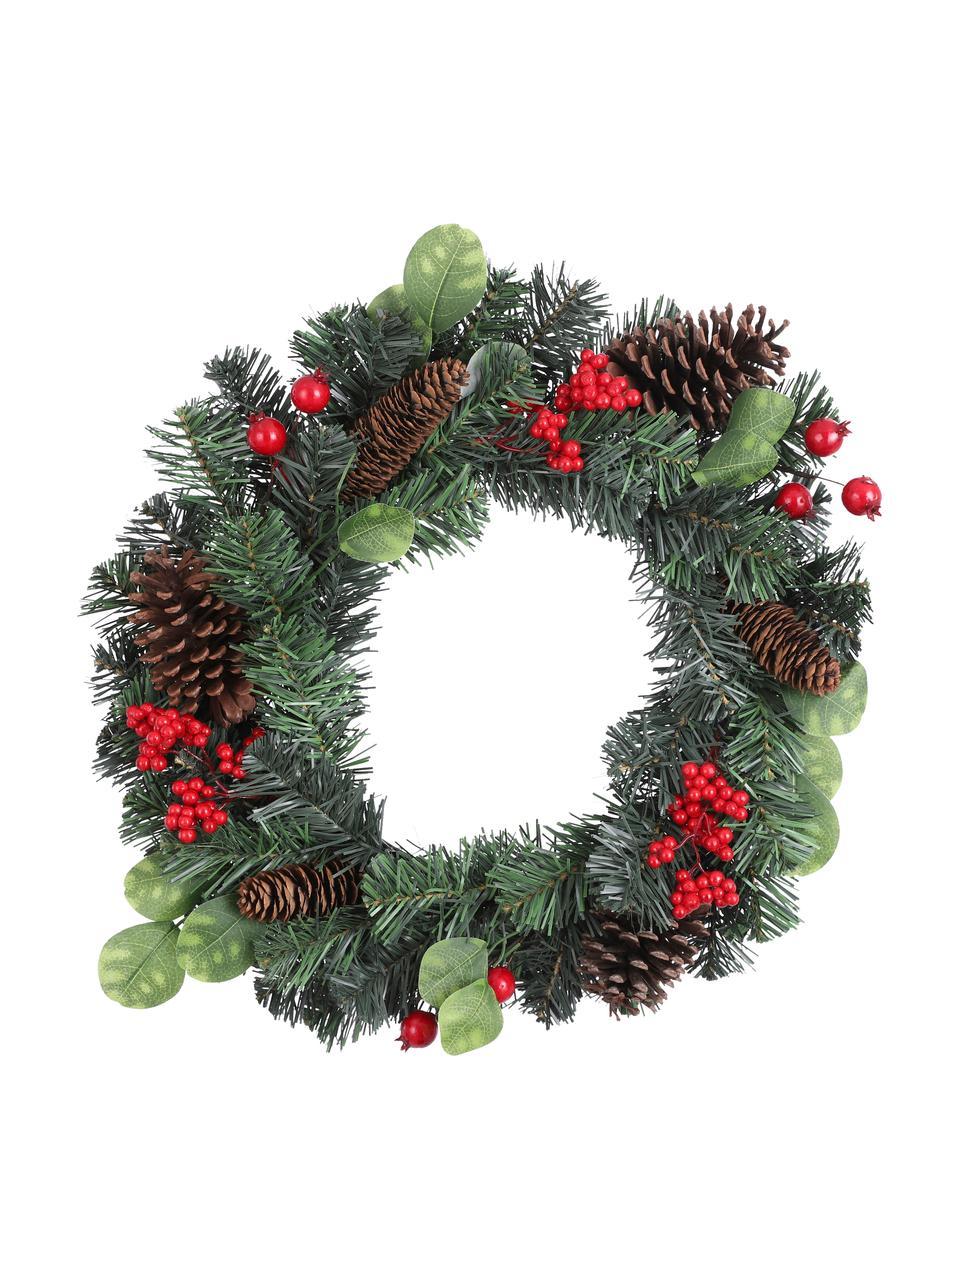 Ghirlanda natalizia artificiale Matiz, Materiale sintetico, Verde, rosso, marrone, Ø 50 cm